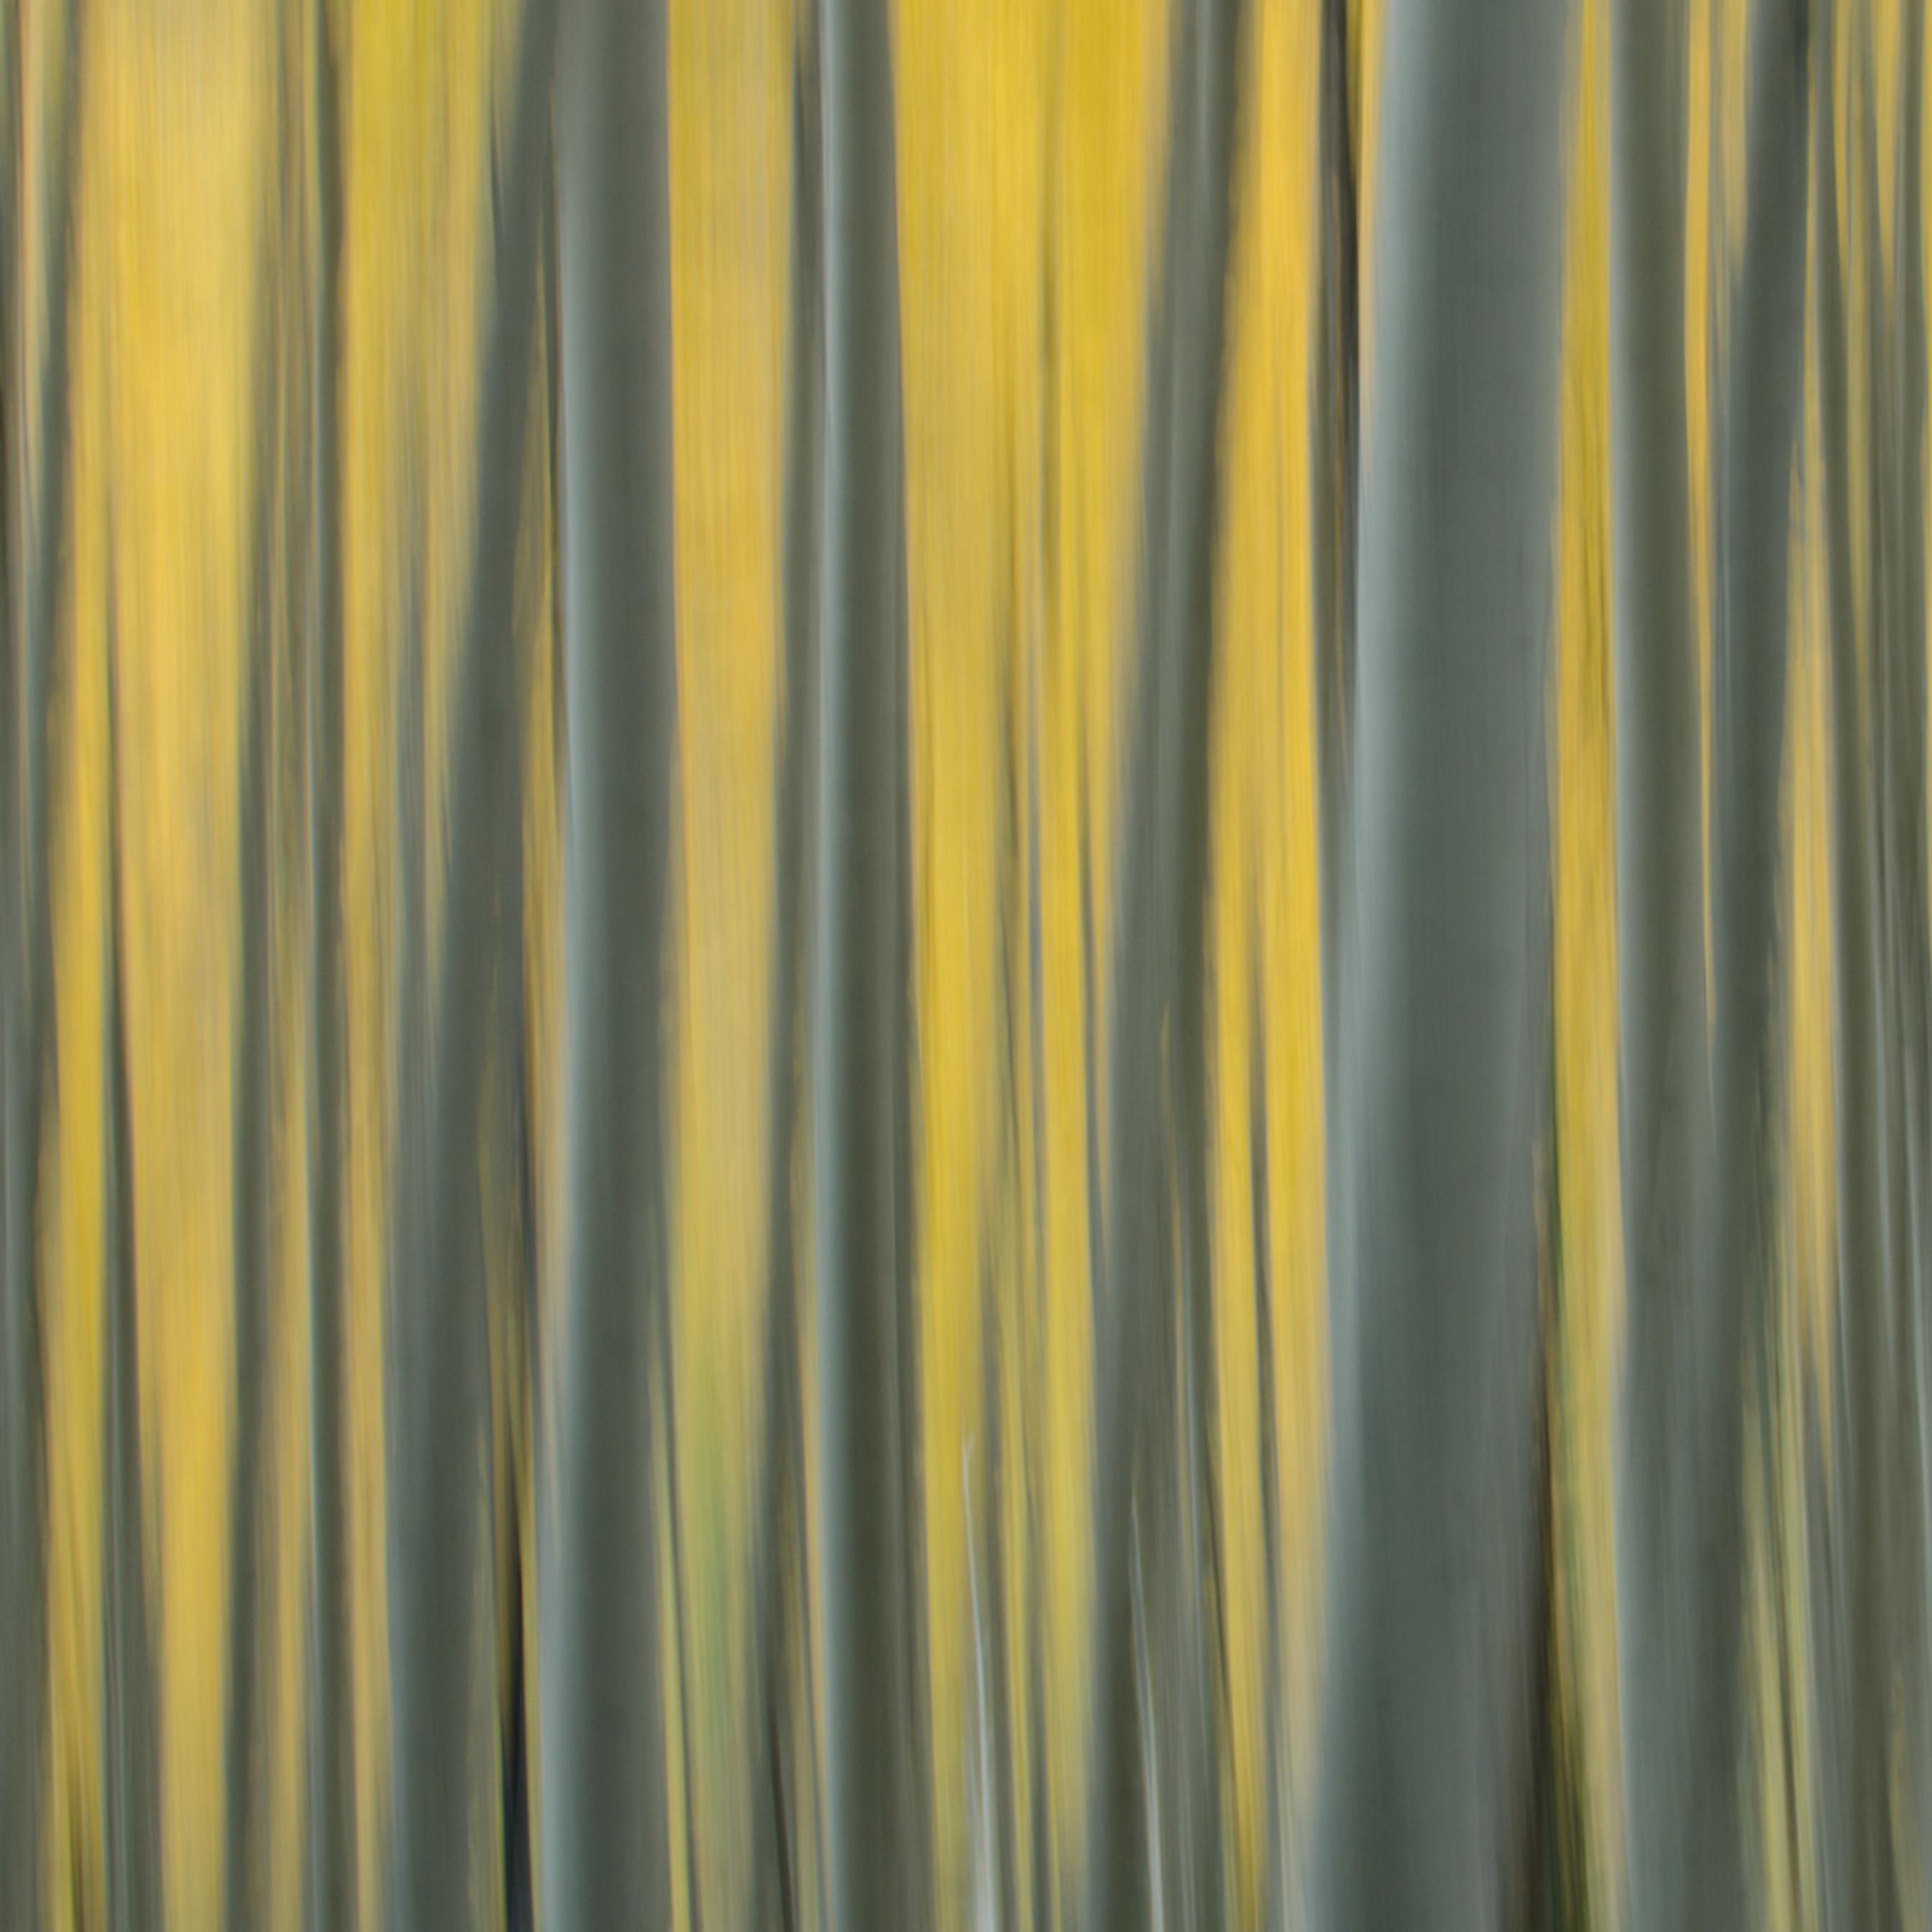 Yellow aspen gfwzh9